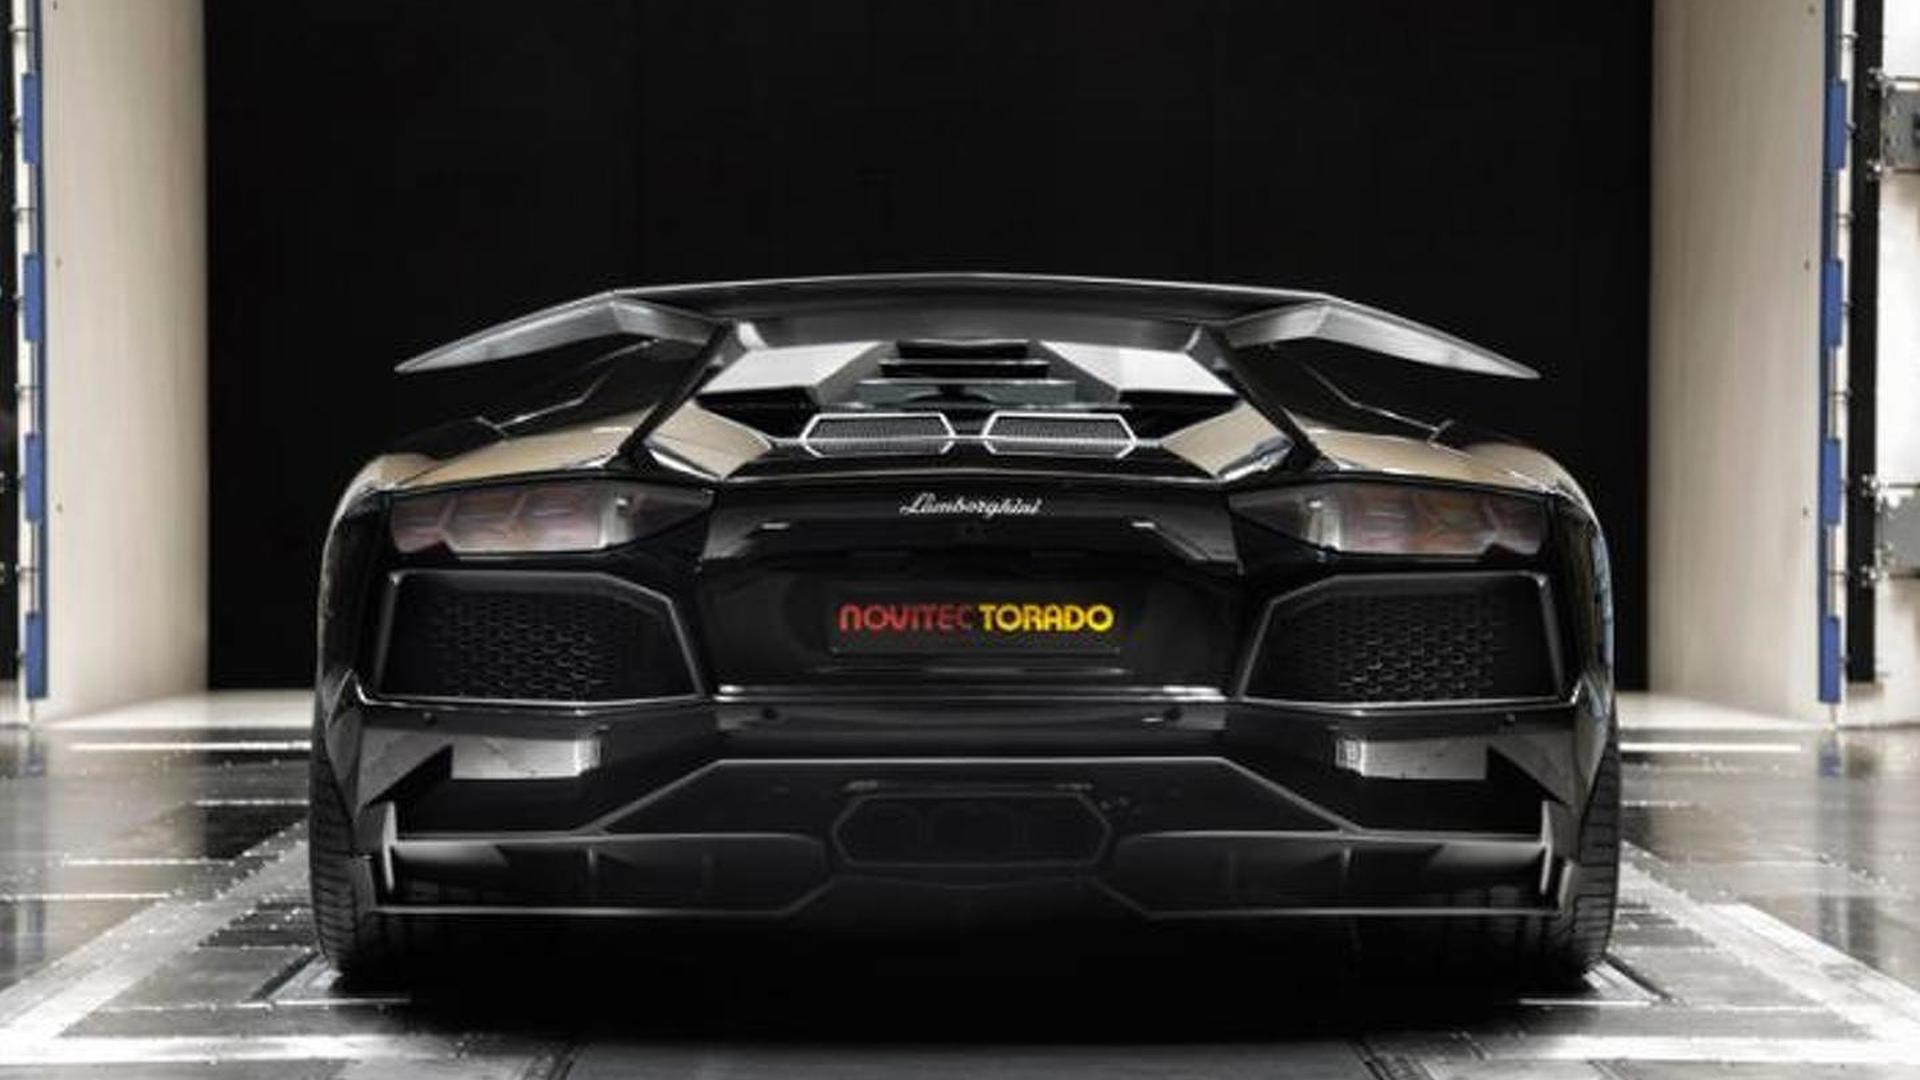 Novitec Tunes The Lamborghini Aventador Lp700 4 To 969 Hp Video